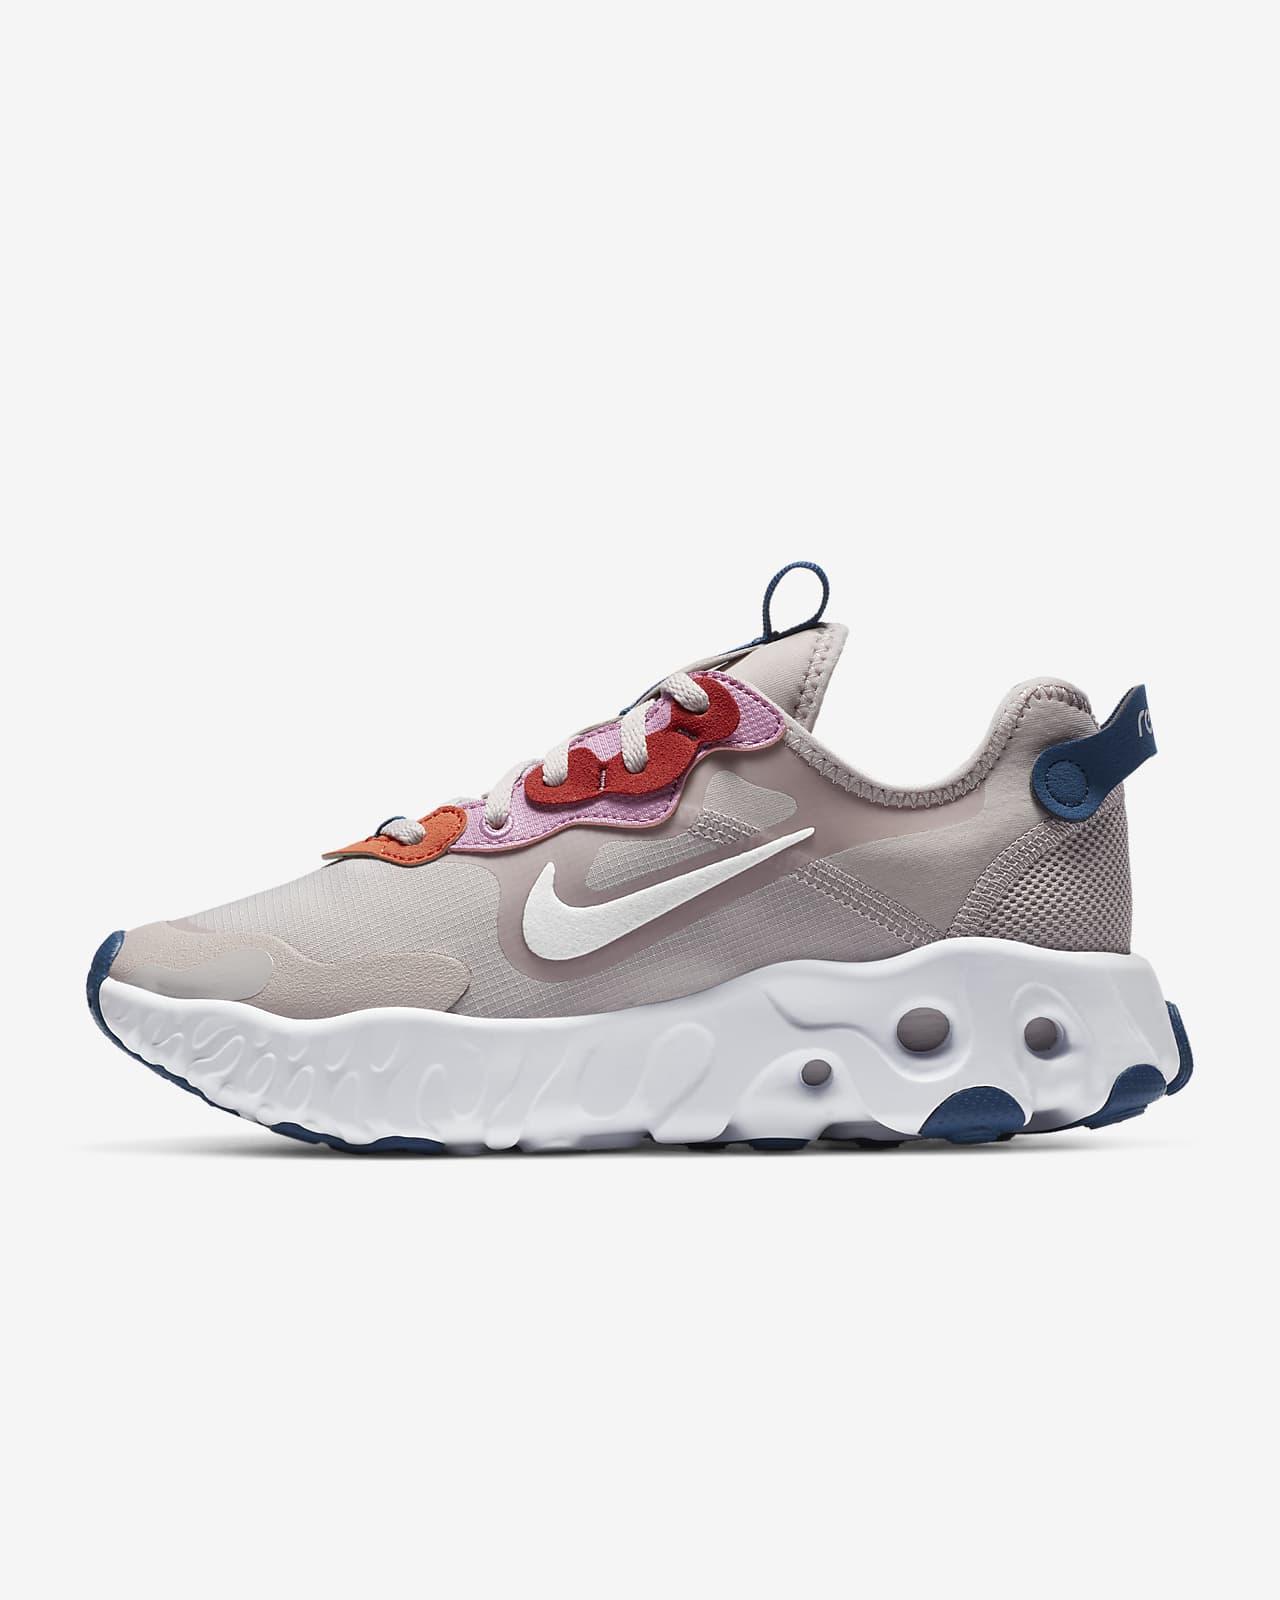 Nike React Art3mis Women's Shoe. Nike PT